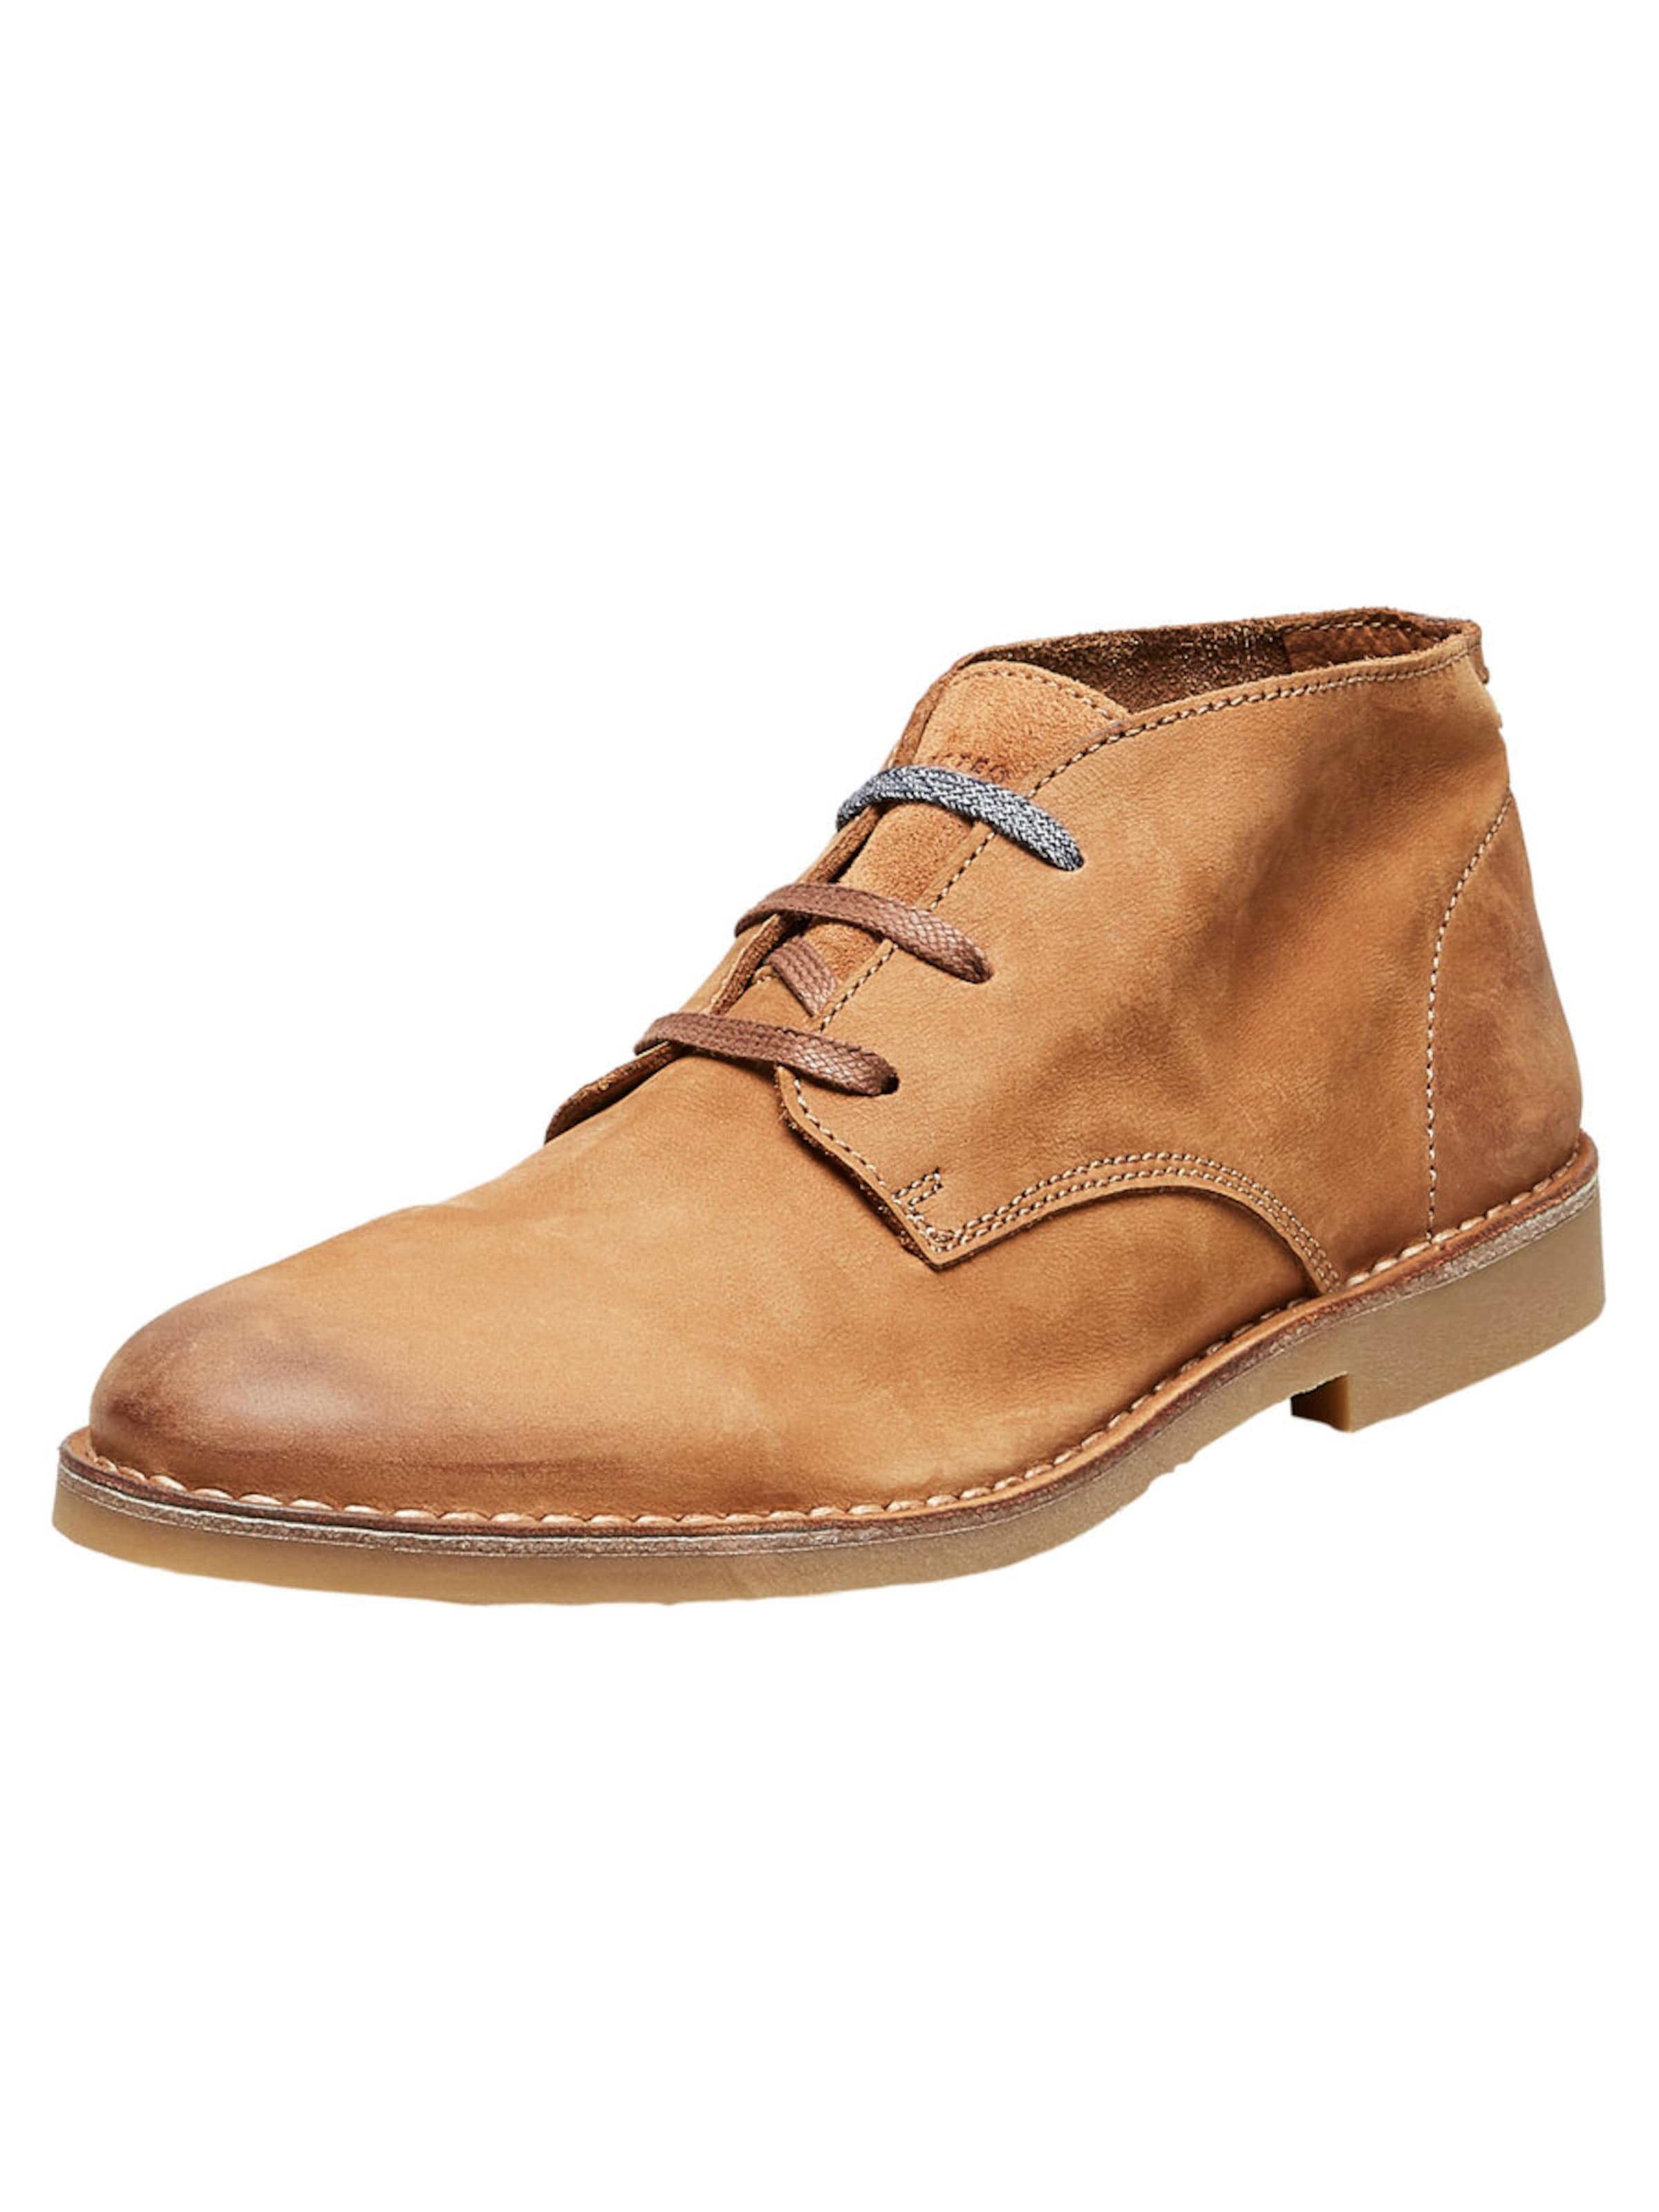 SELECTED HOMME Desert-Boots Günstige und langlebige Schuhe